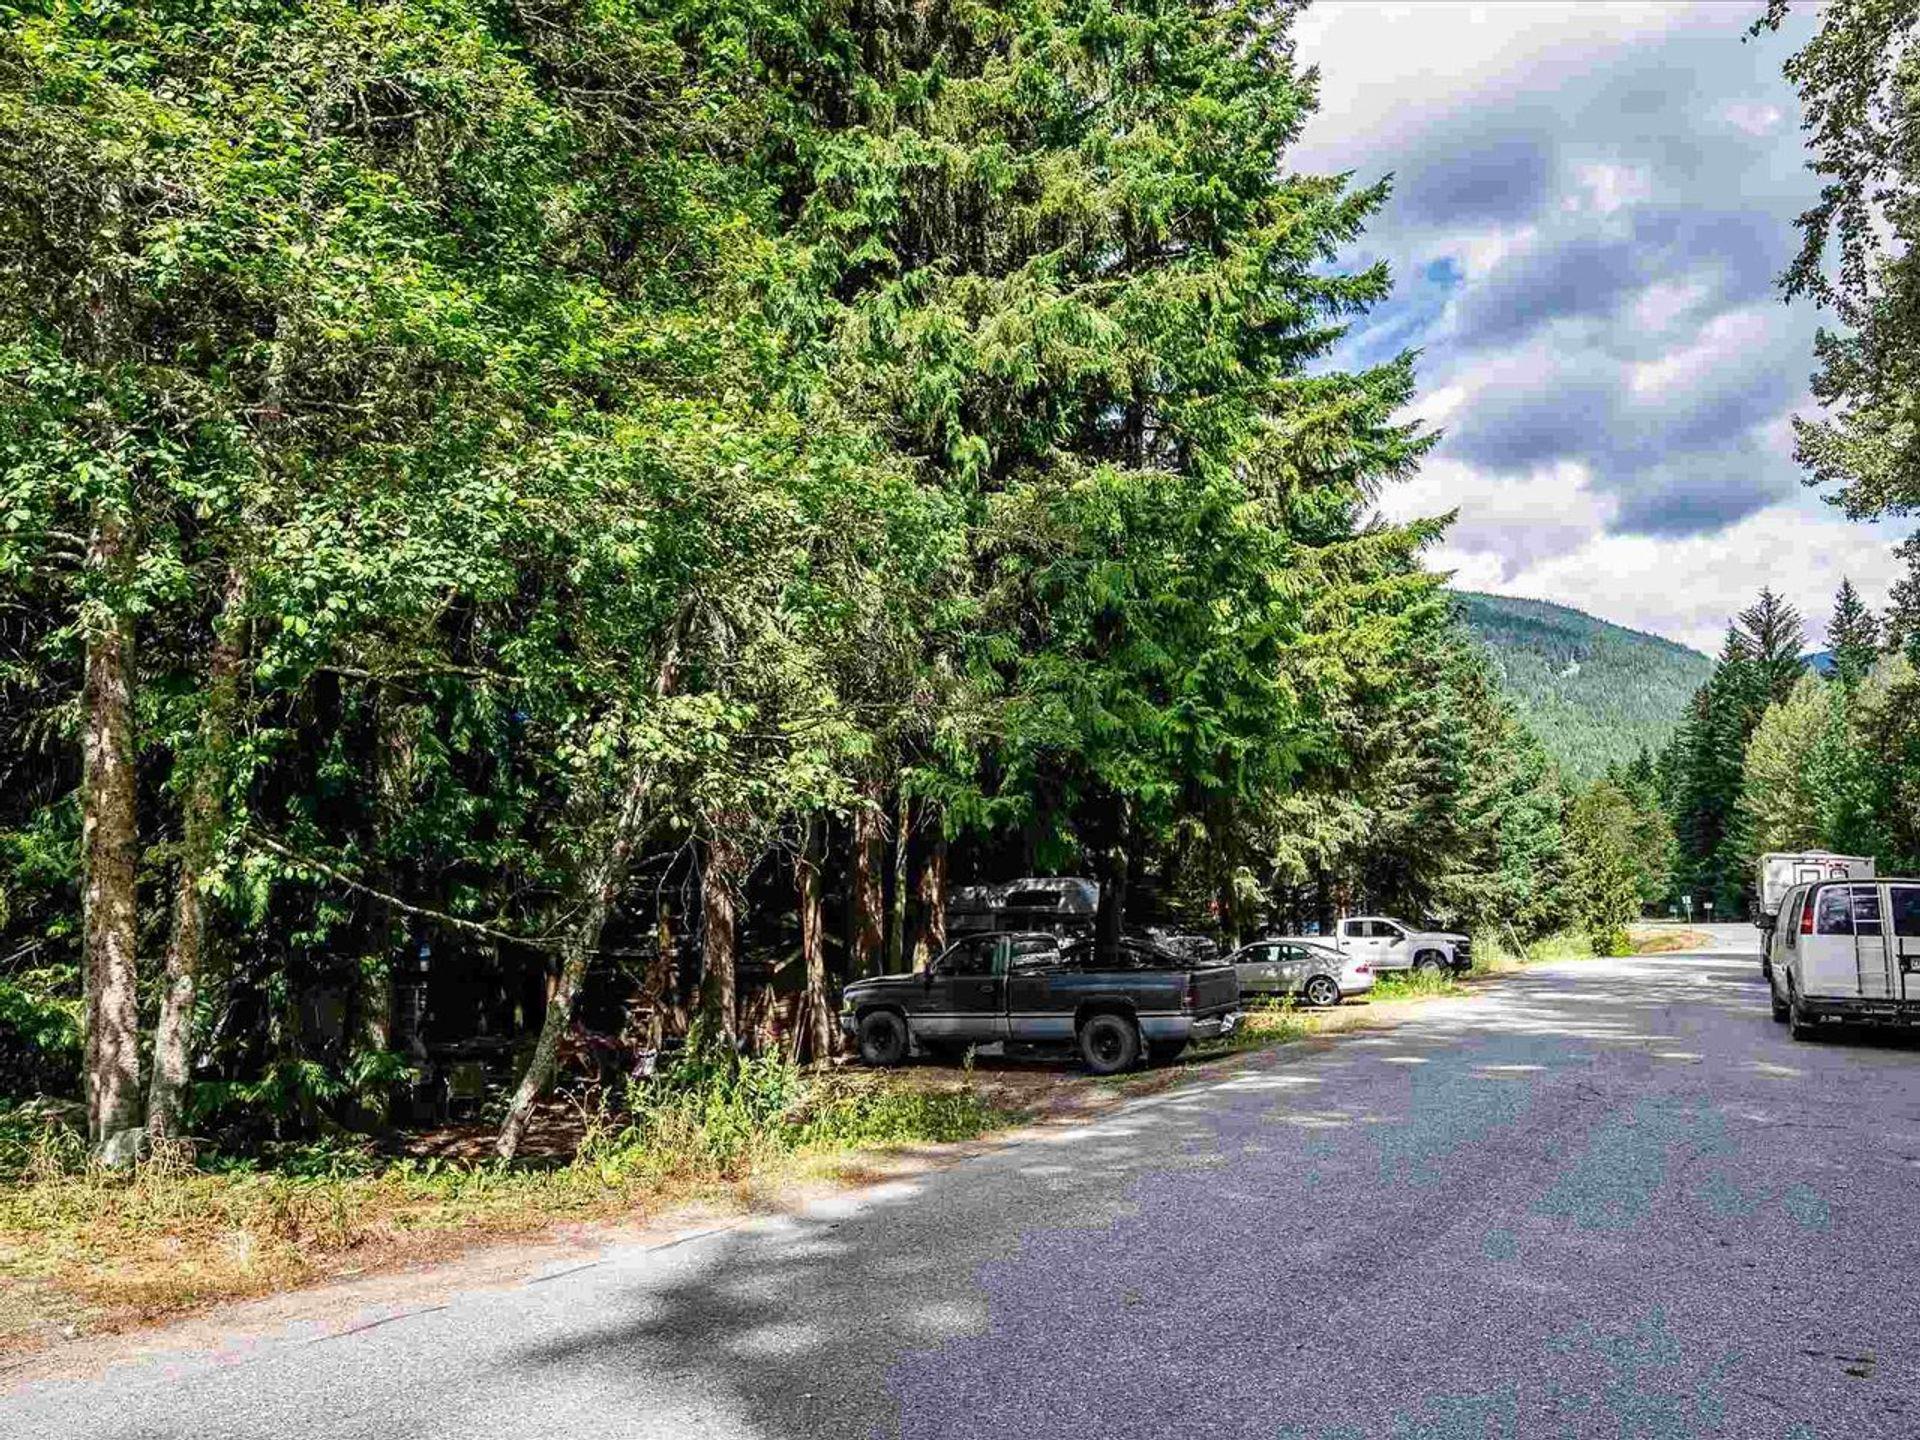 6517-balsam-way-whistler-cay-estates-whistler-16 at 6517 Balsam Way, Whistler Cay Estates, Whistler